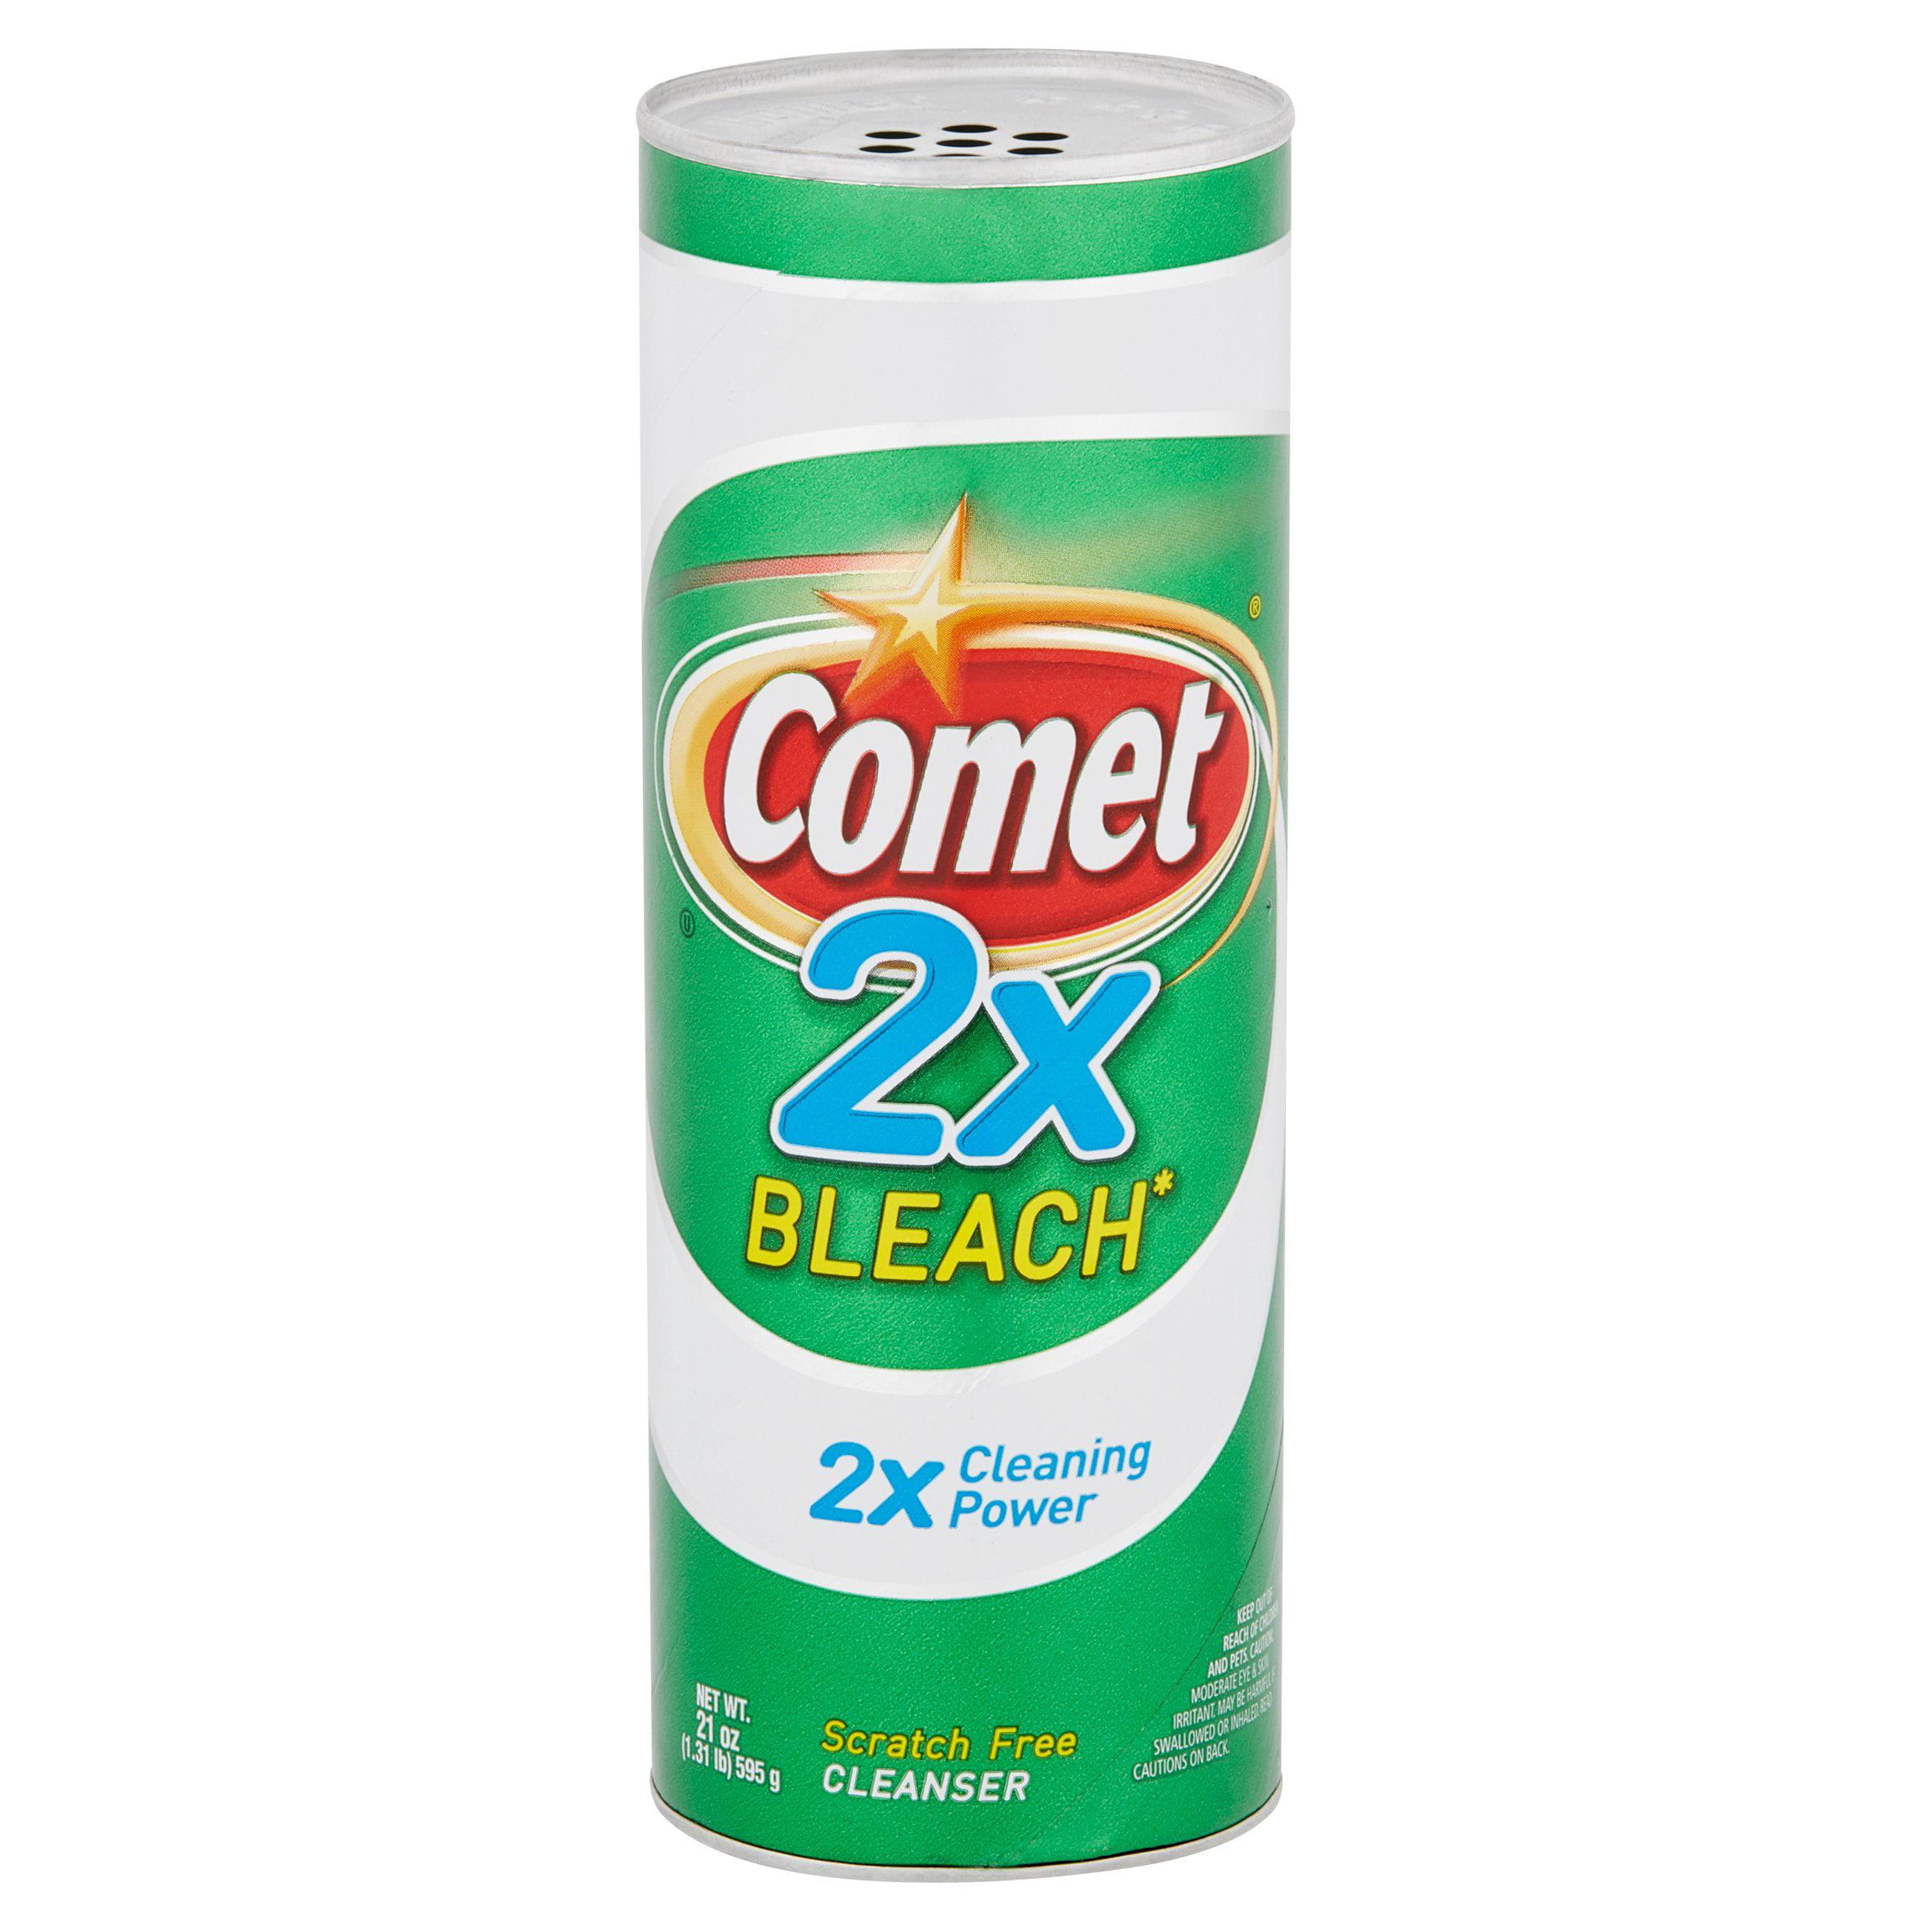 Bleaching powder for cleaning bathroom - Comet 2x Bleach Cleanser 21 Oz